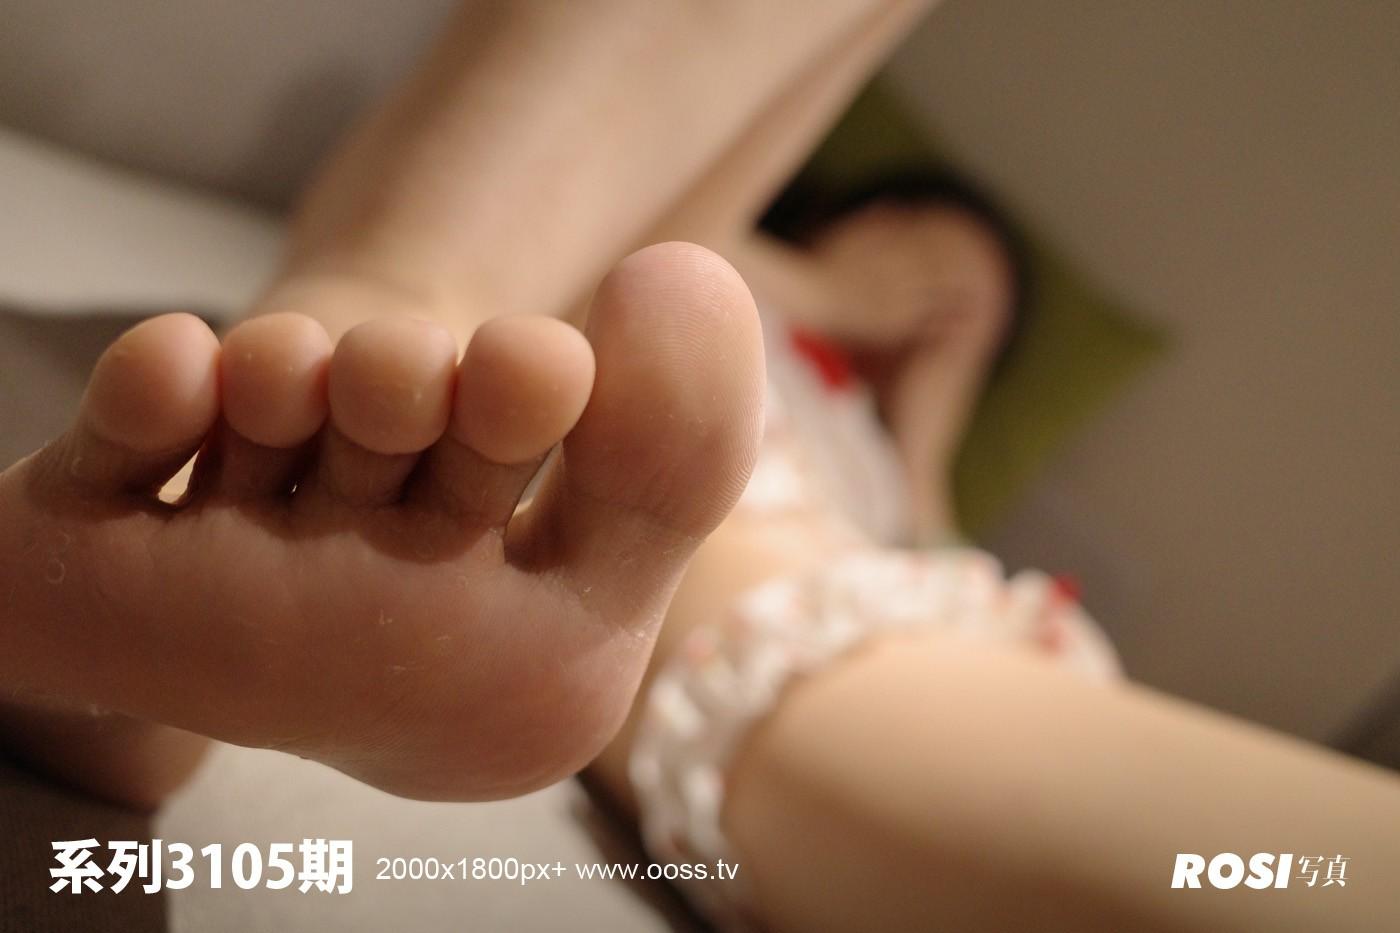 Rosi No.3105